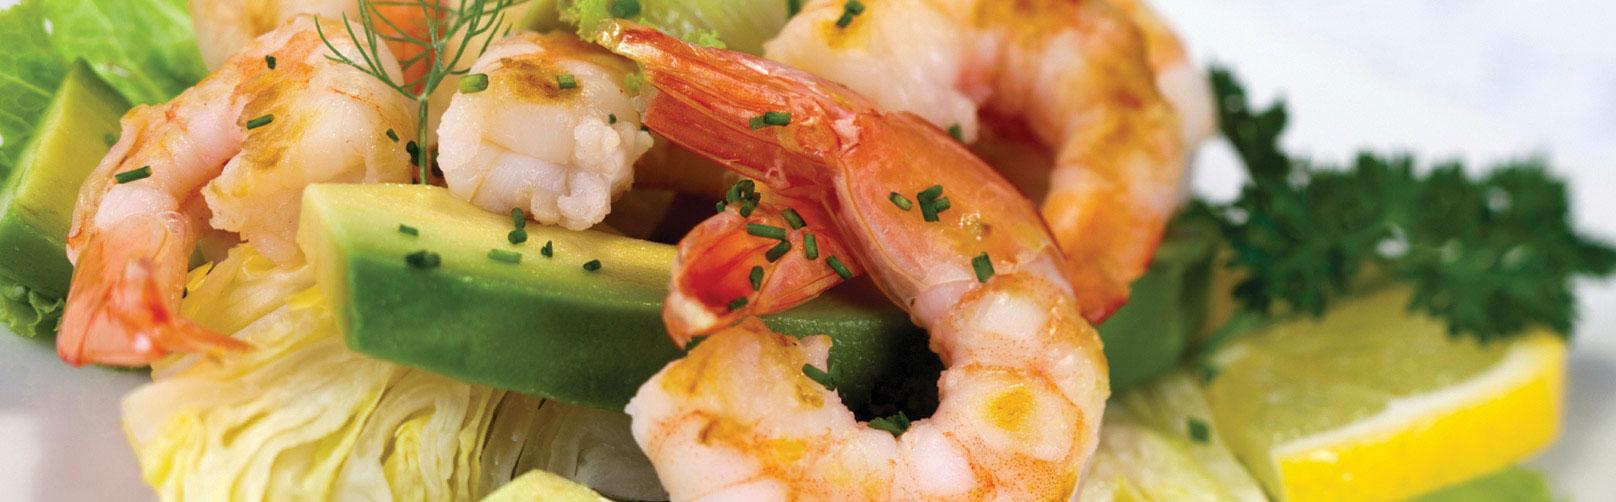 white-shrimp-cooked